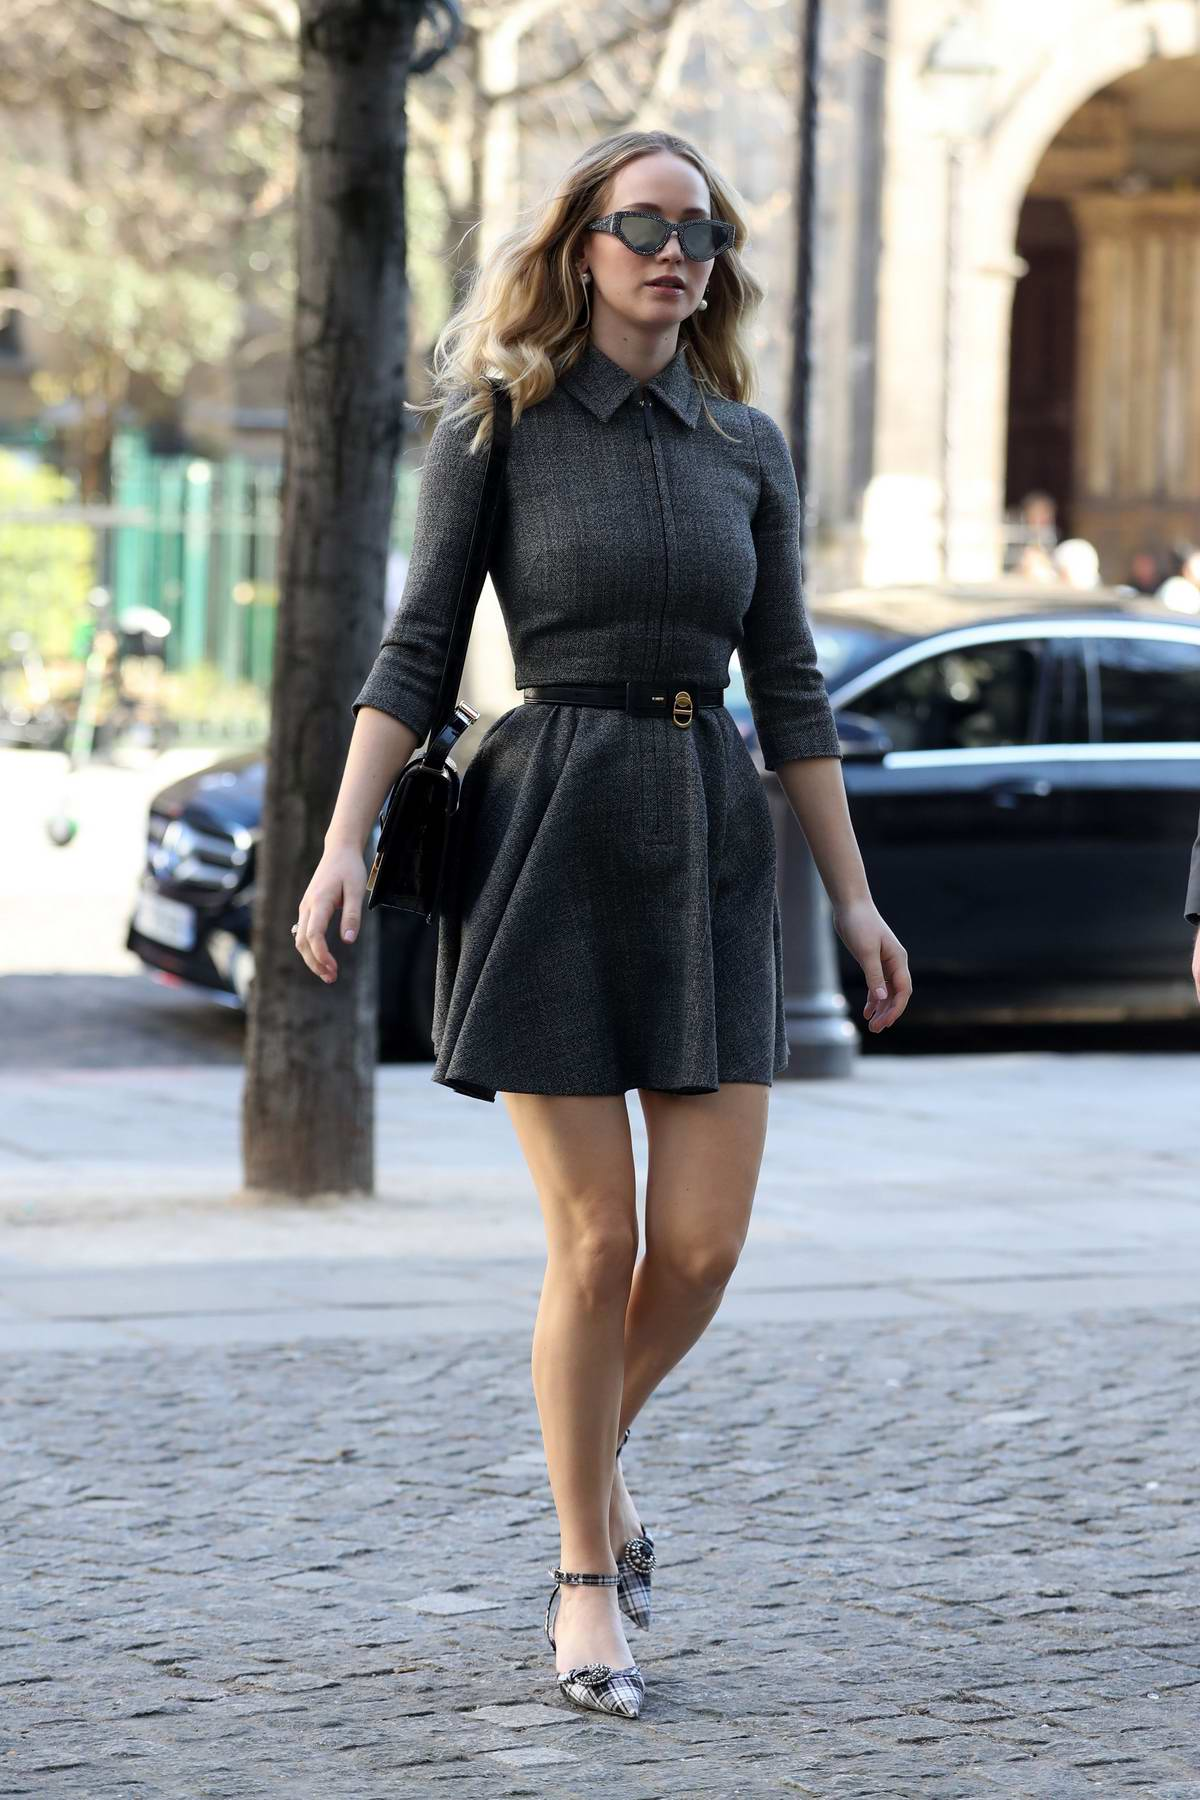 Jennifer Lawrence arrives at La Societe restaurant while attending Paris Fashion Week 2019 in Paris, France